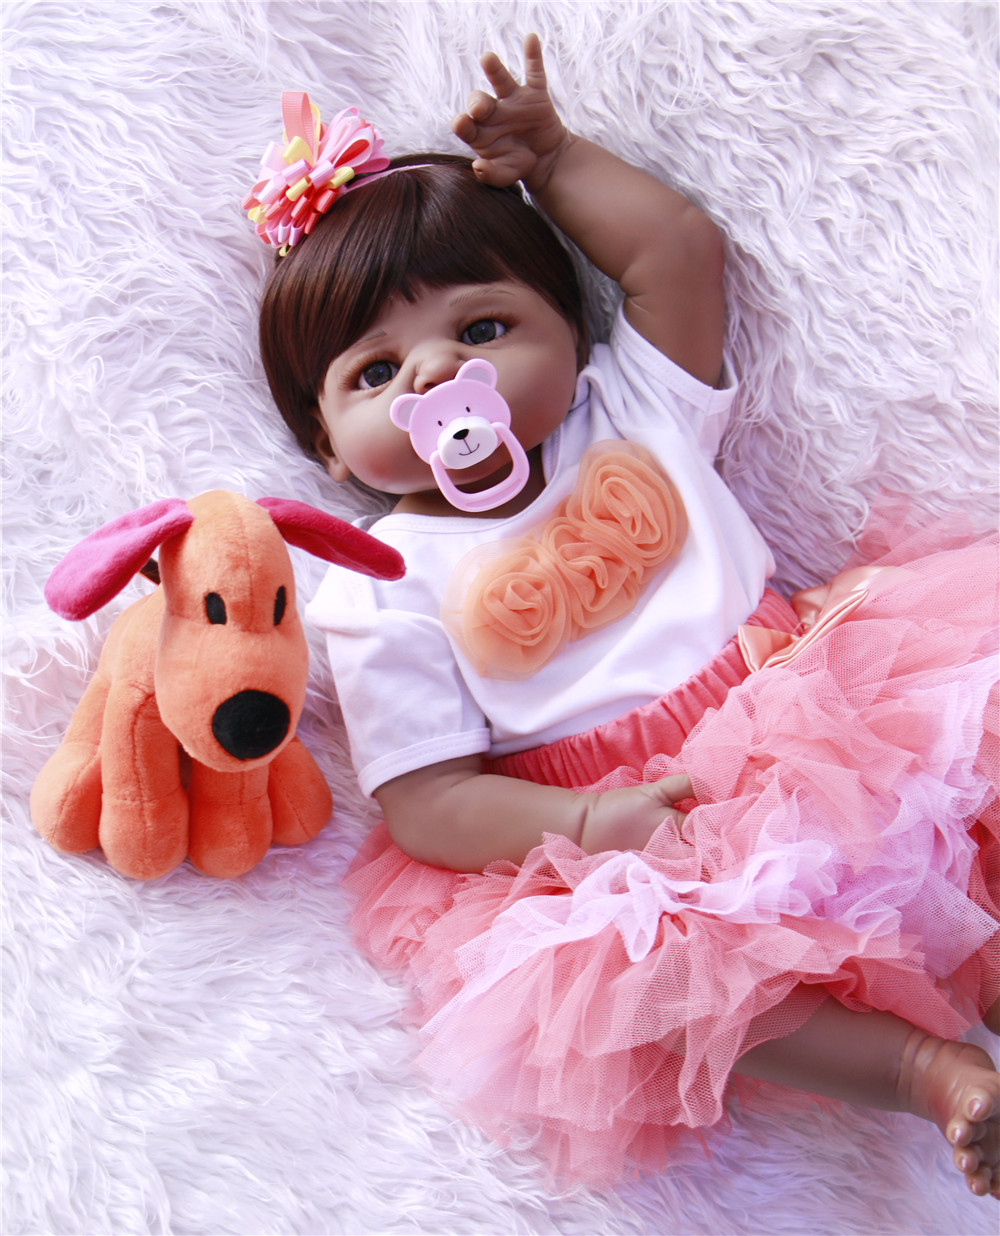 NPK 22 inch girl baby Reborn dolls for girls full body Silicone Toddler kids Newborn bebe Dolls cute Lifelike 55cm